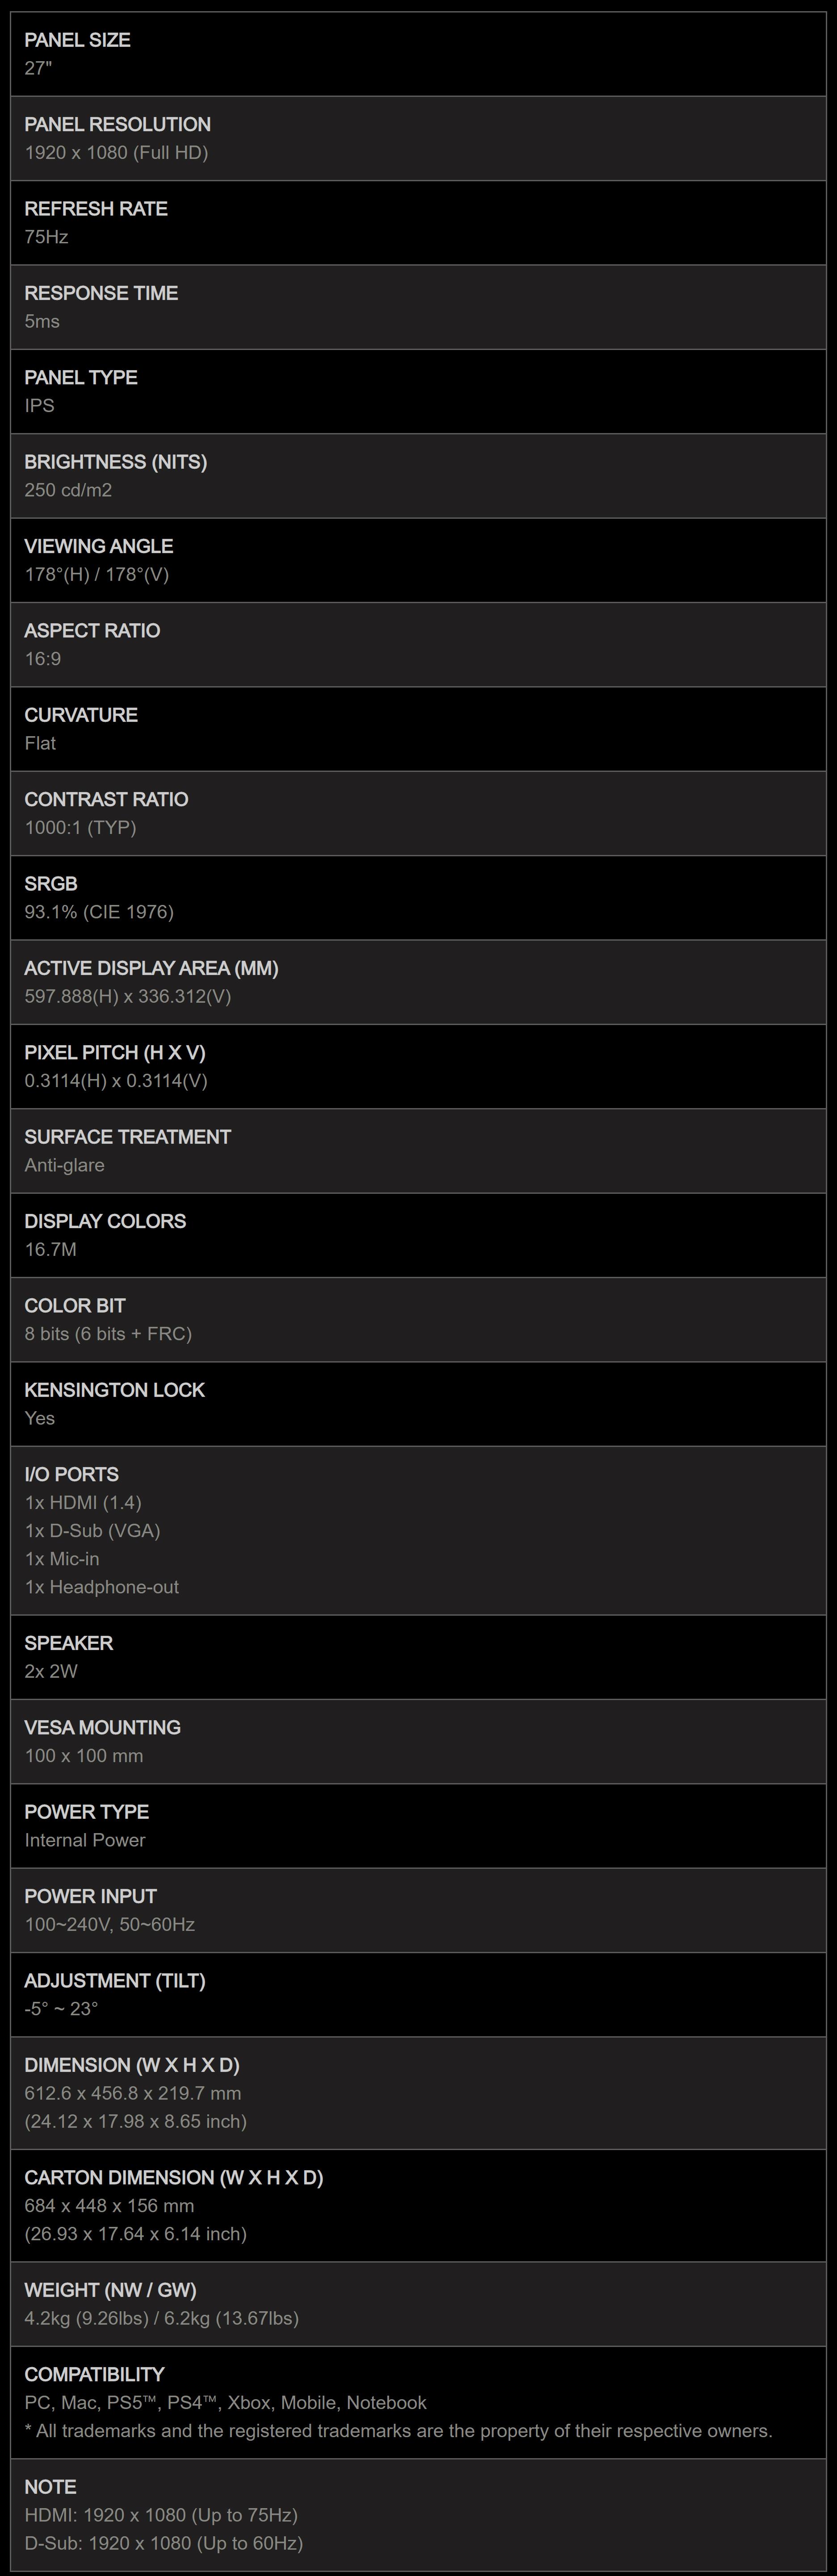 screencapture-msi-Business-Productivity-Monitor-PRO-MP271-Specification-2021-04-15-09_31_30.jpg